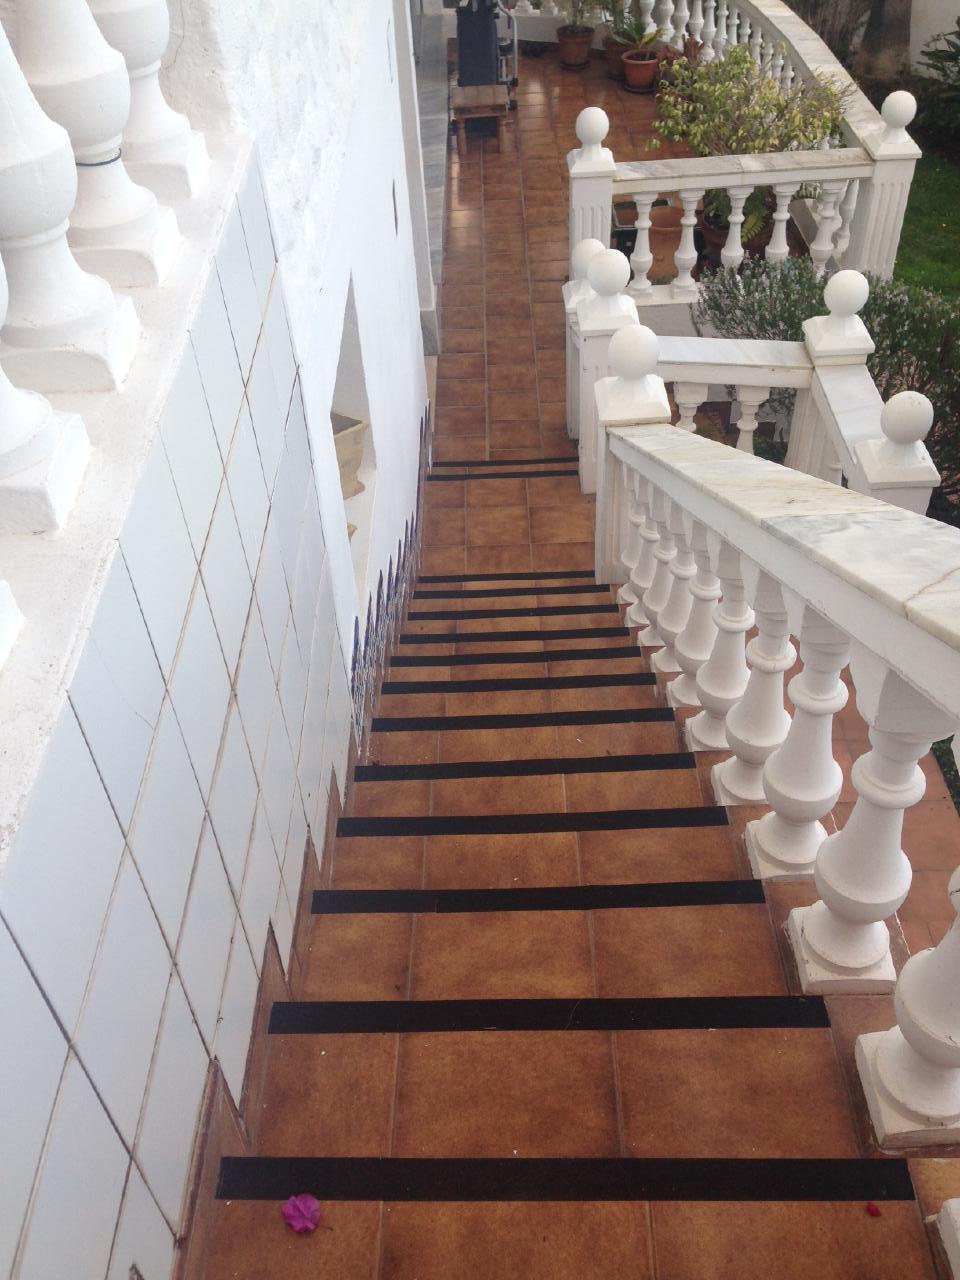 Appartement de vacances Villa Larnia Familien Apartment   * Urlaub für Körper, Geist und Seele * (2529406), El Sauzal, Ténérife, Iles Canaries, Espagne, image 7